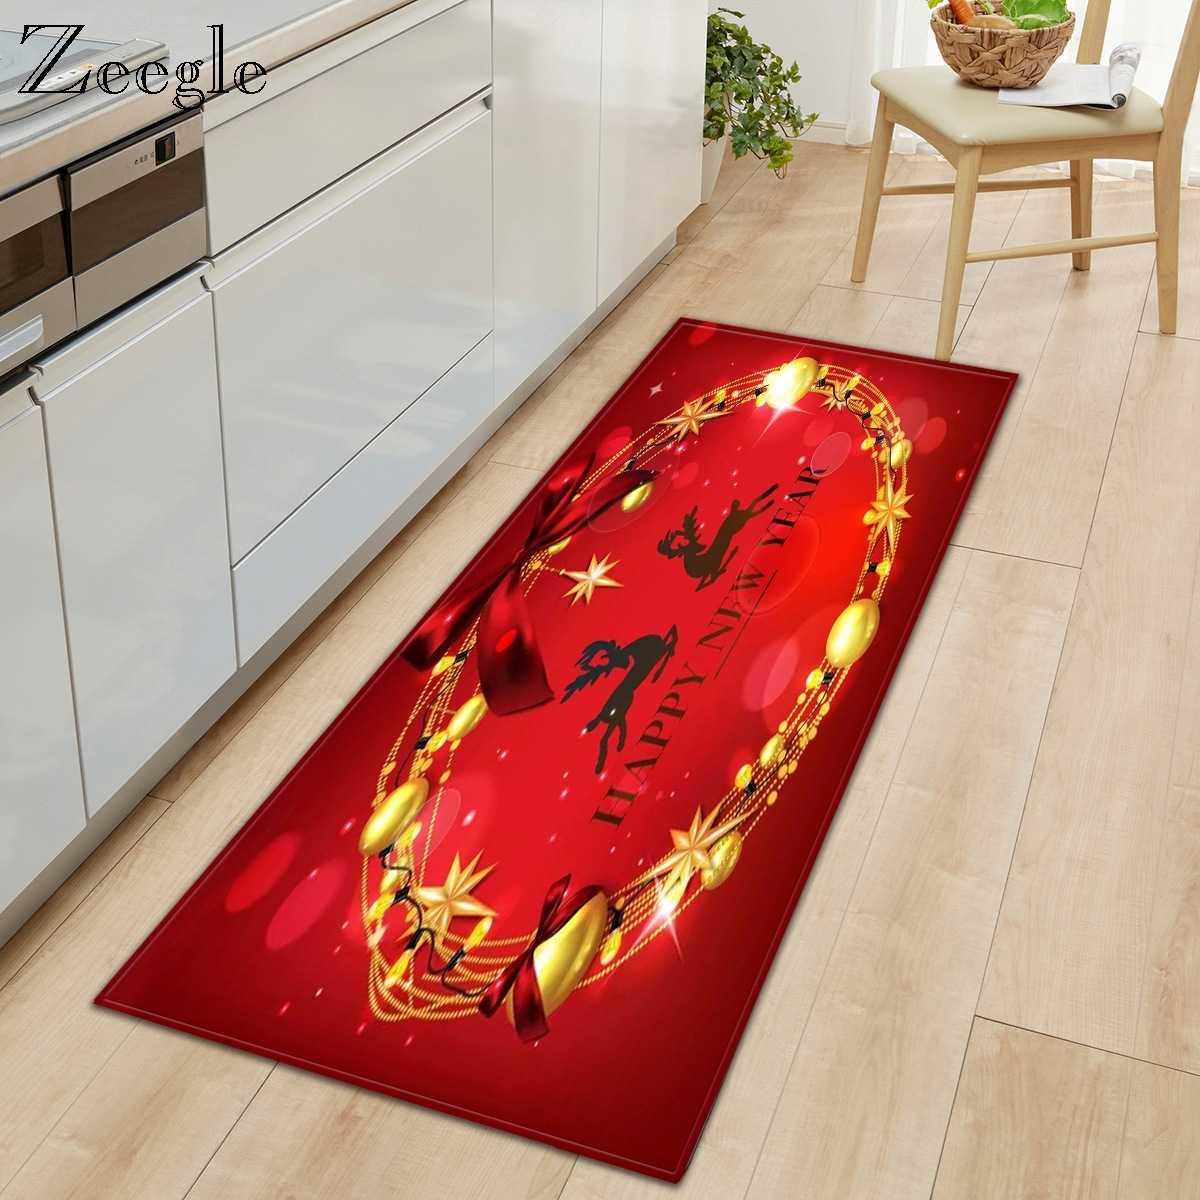 Zeegle Christmas Kitchen Mat Modern Area Rug Long Floor Mat Carpet Printed Entrance Doormat Anti Slip Doormat Bedroom Foot Rug Carpet Aliexpress